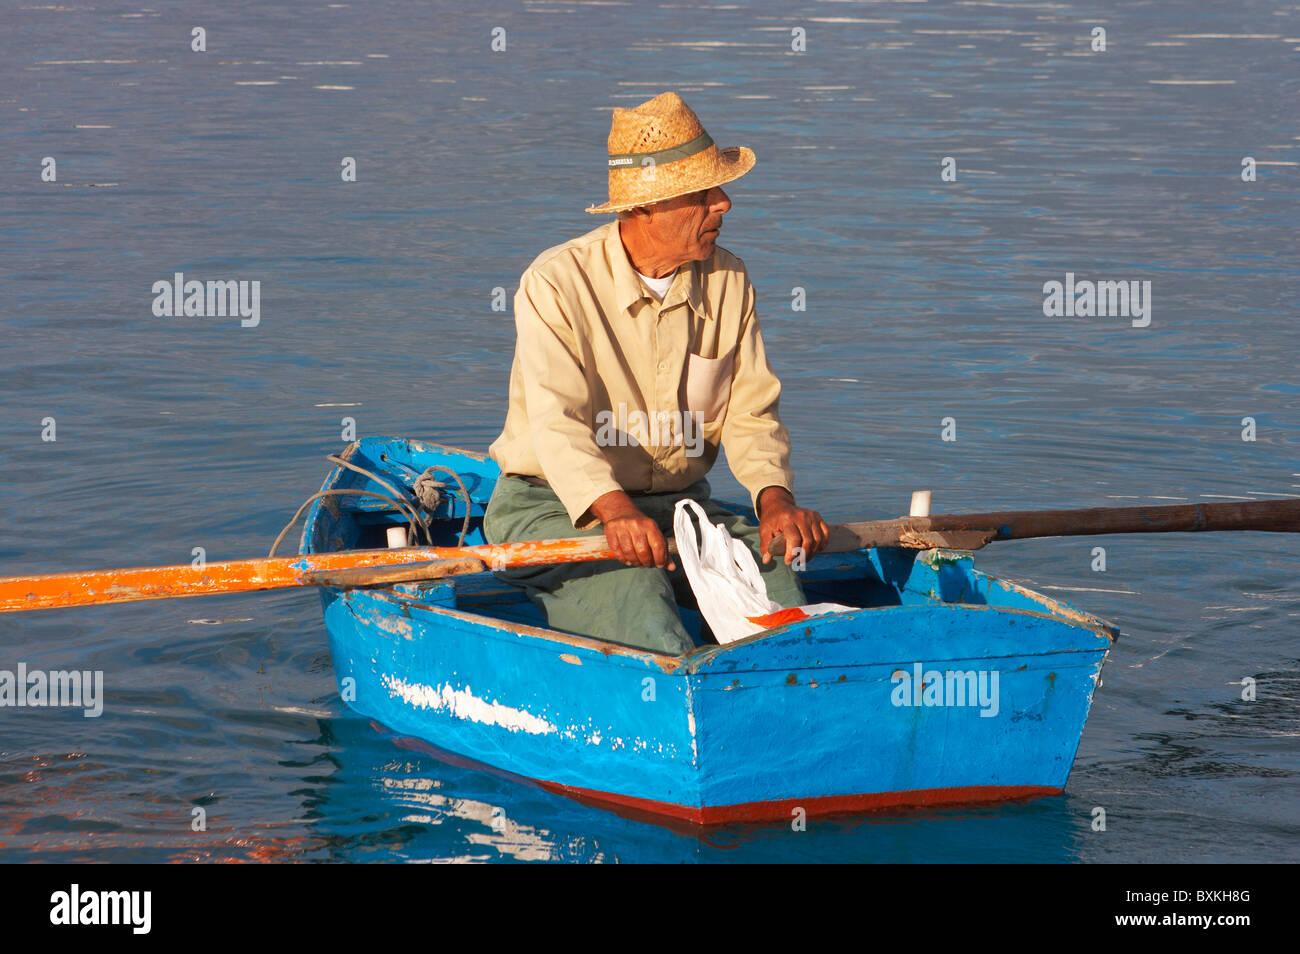 La Graciosa Island, Fisherman In Rowing Boat - Stock Image